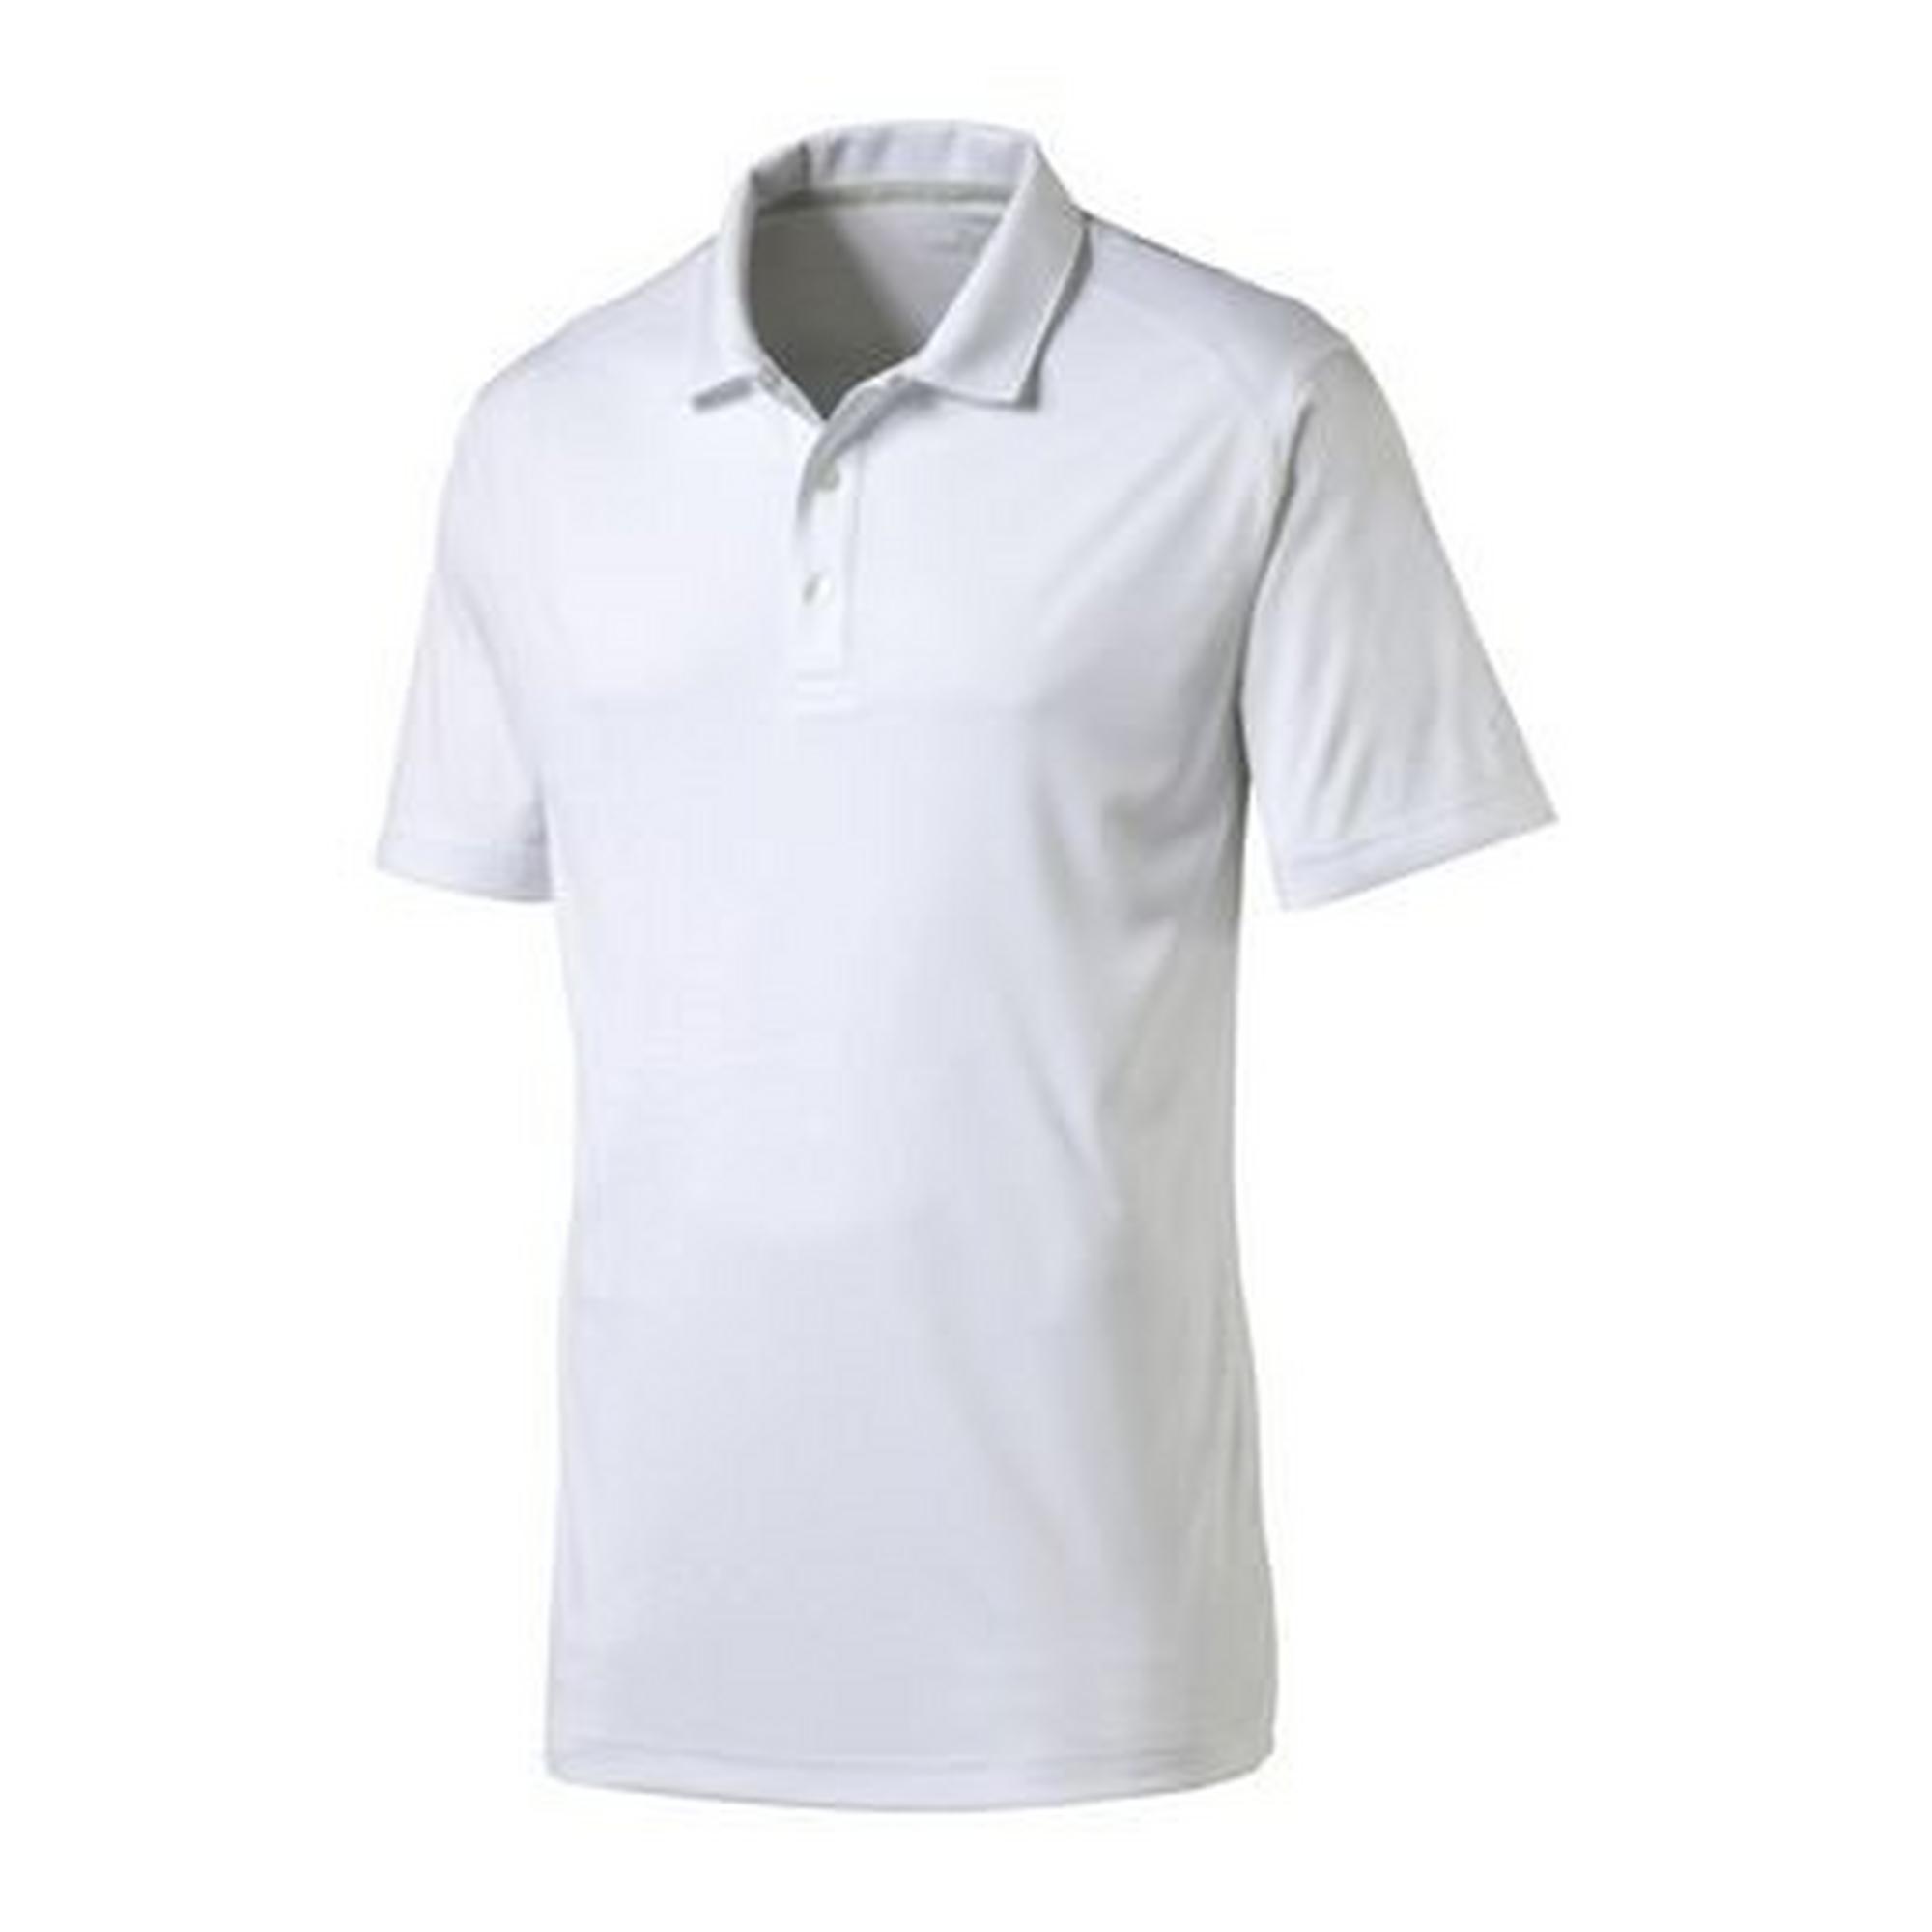 Men's Pounce Cresting Short Sleeve Polo